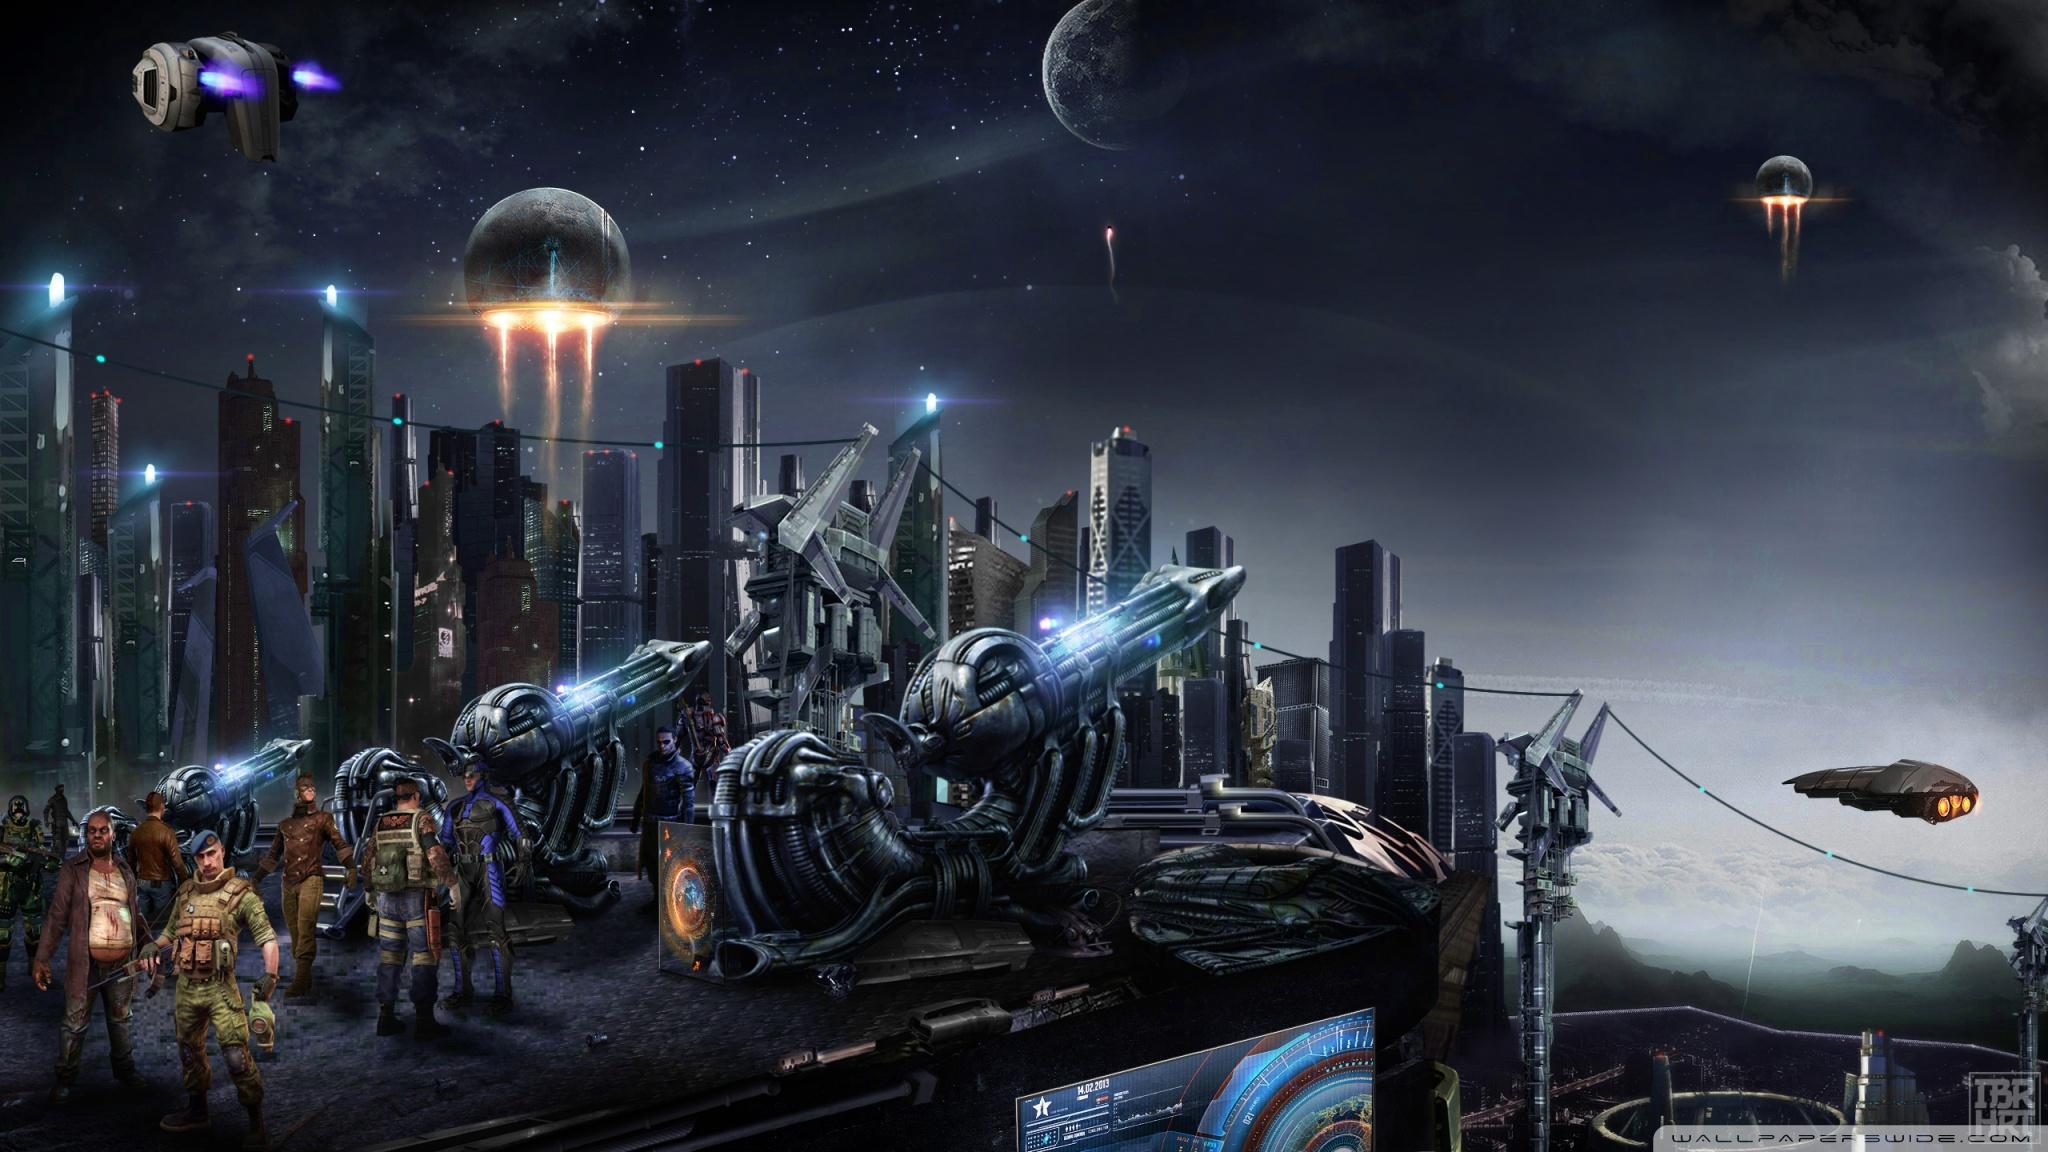 Alien Planet Windows 7 3d Wallpaper Futuristic City 4k Hd Desktop Wallpaper For Wide Amp Ultra